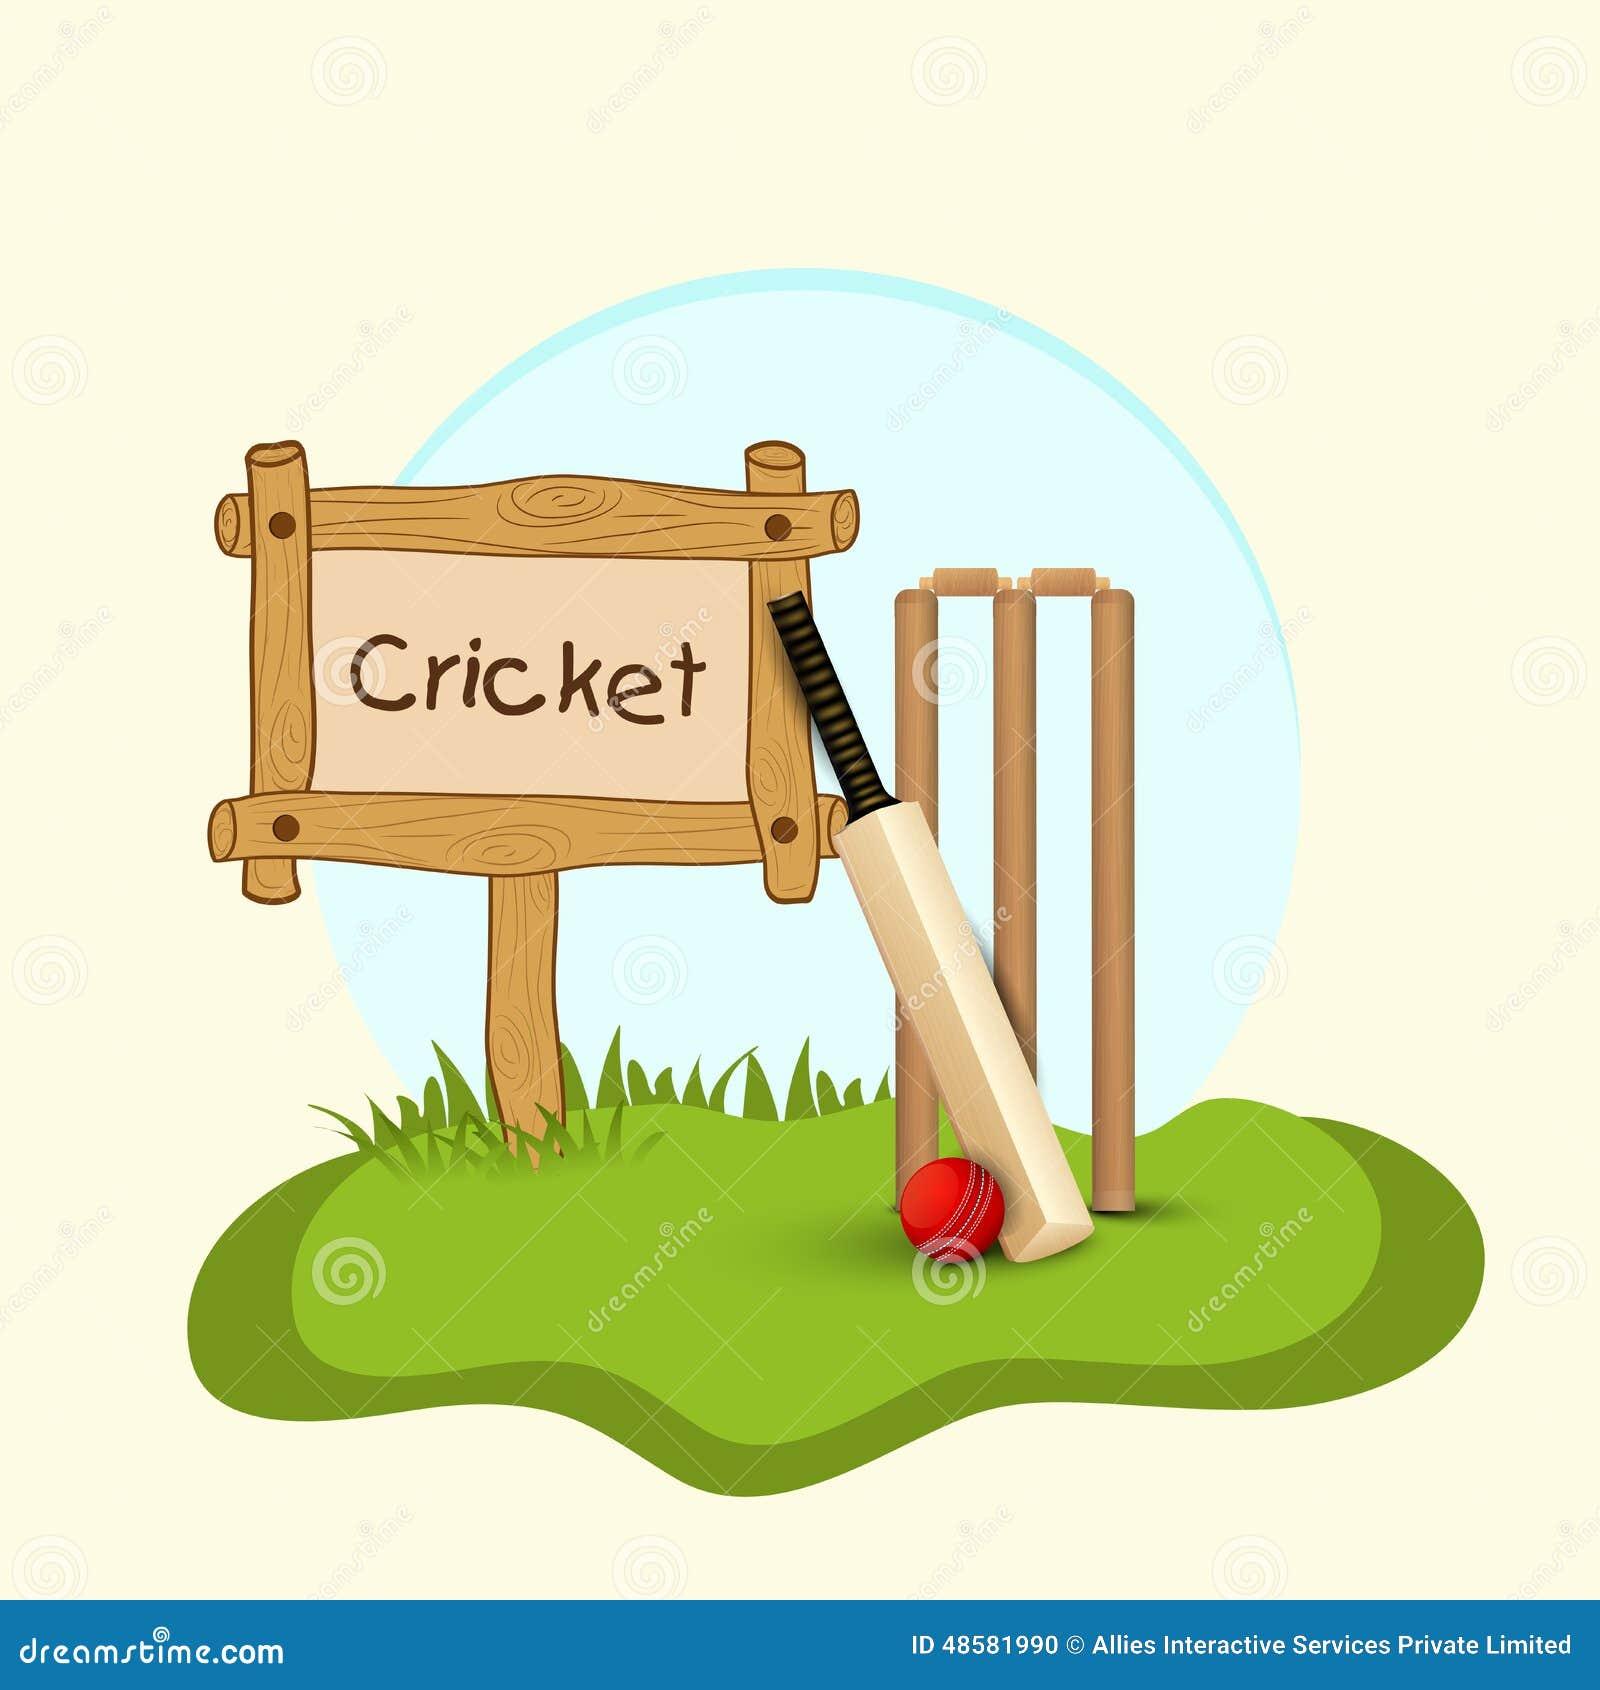 Cricket Bat, Ball And Wicket Stumps. Stock Photo - Image ...